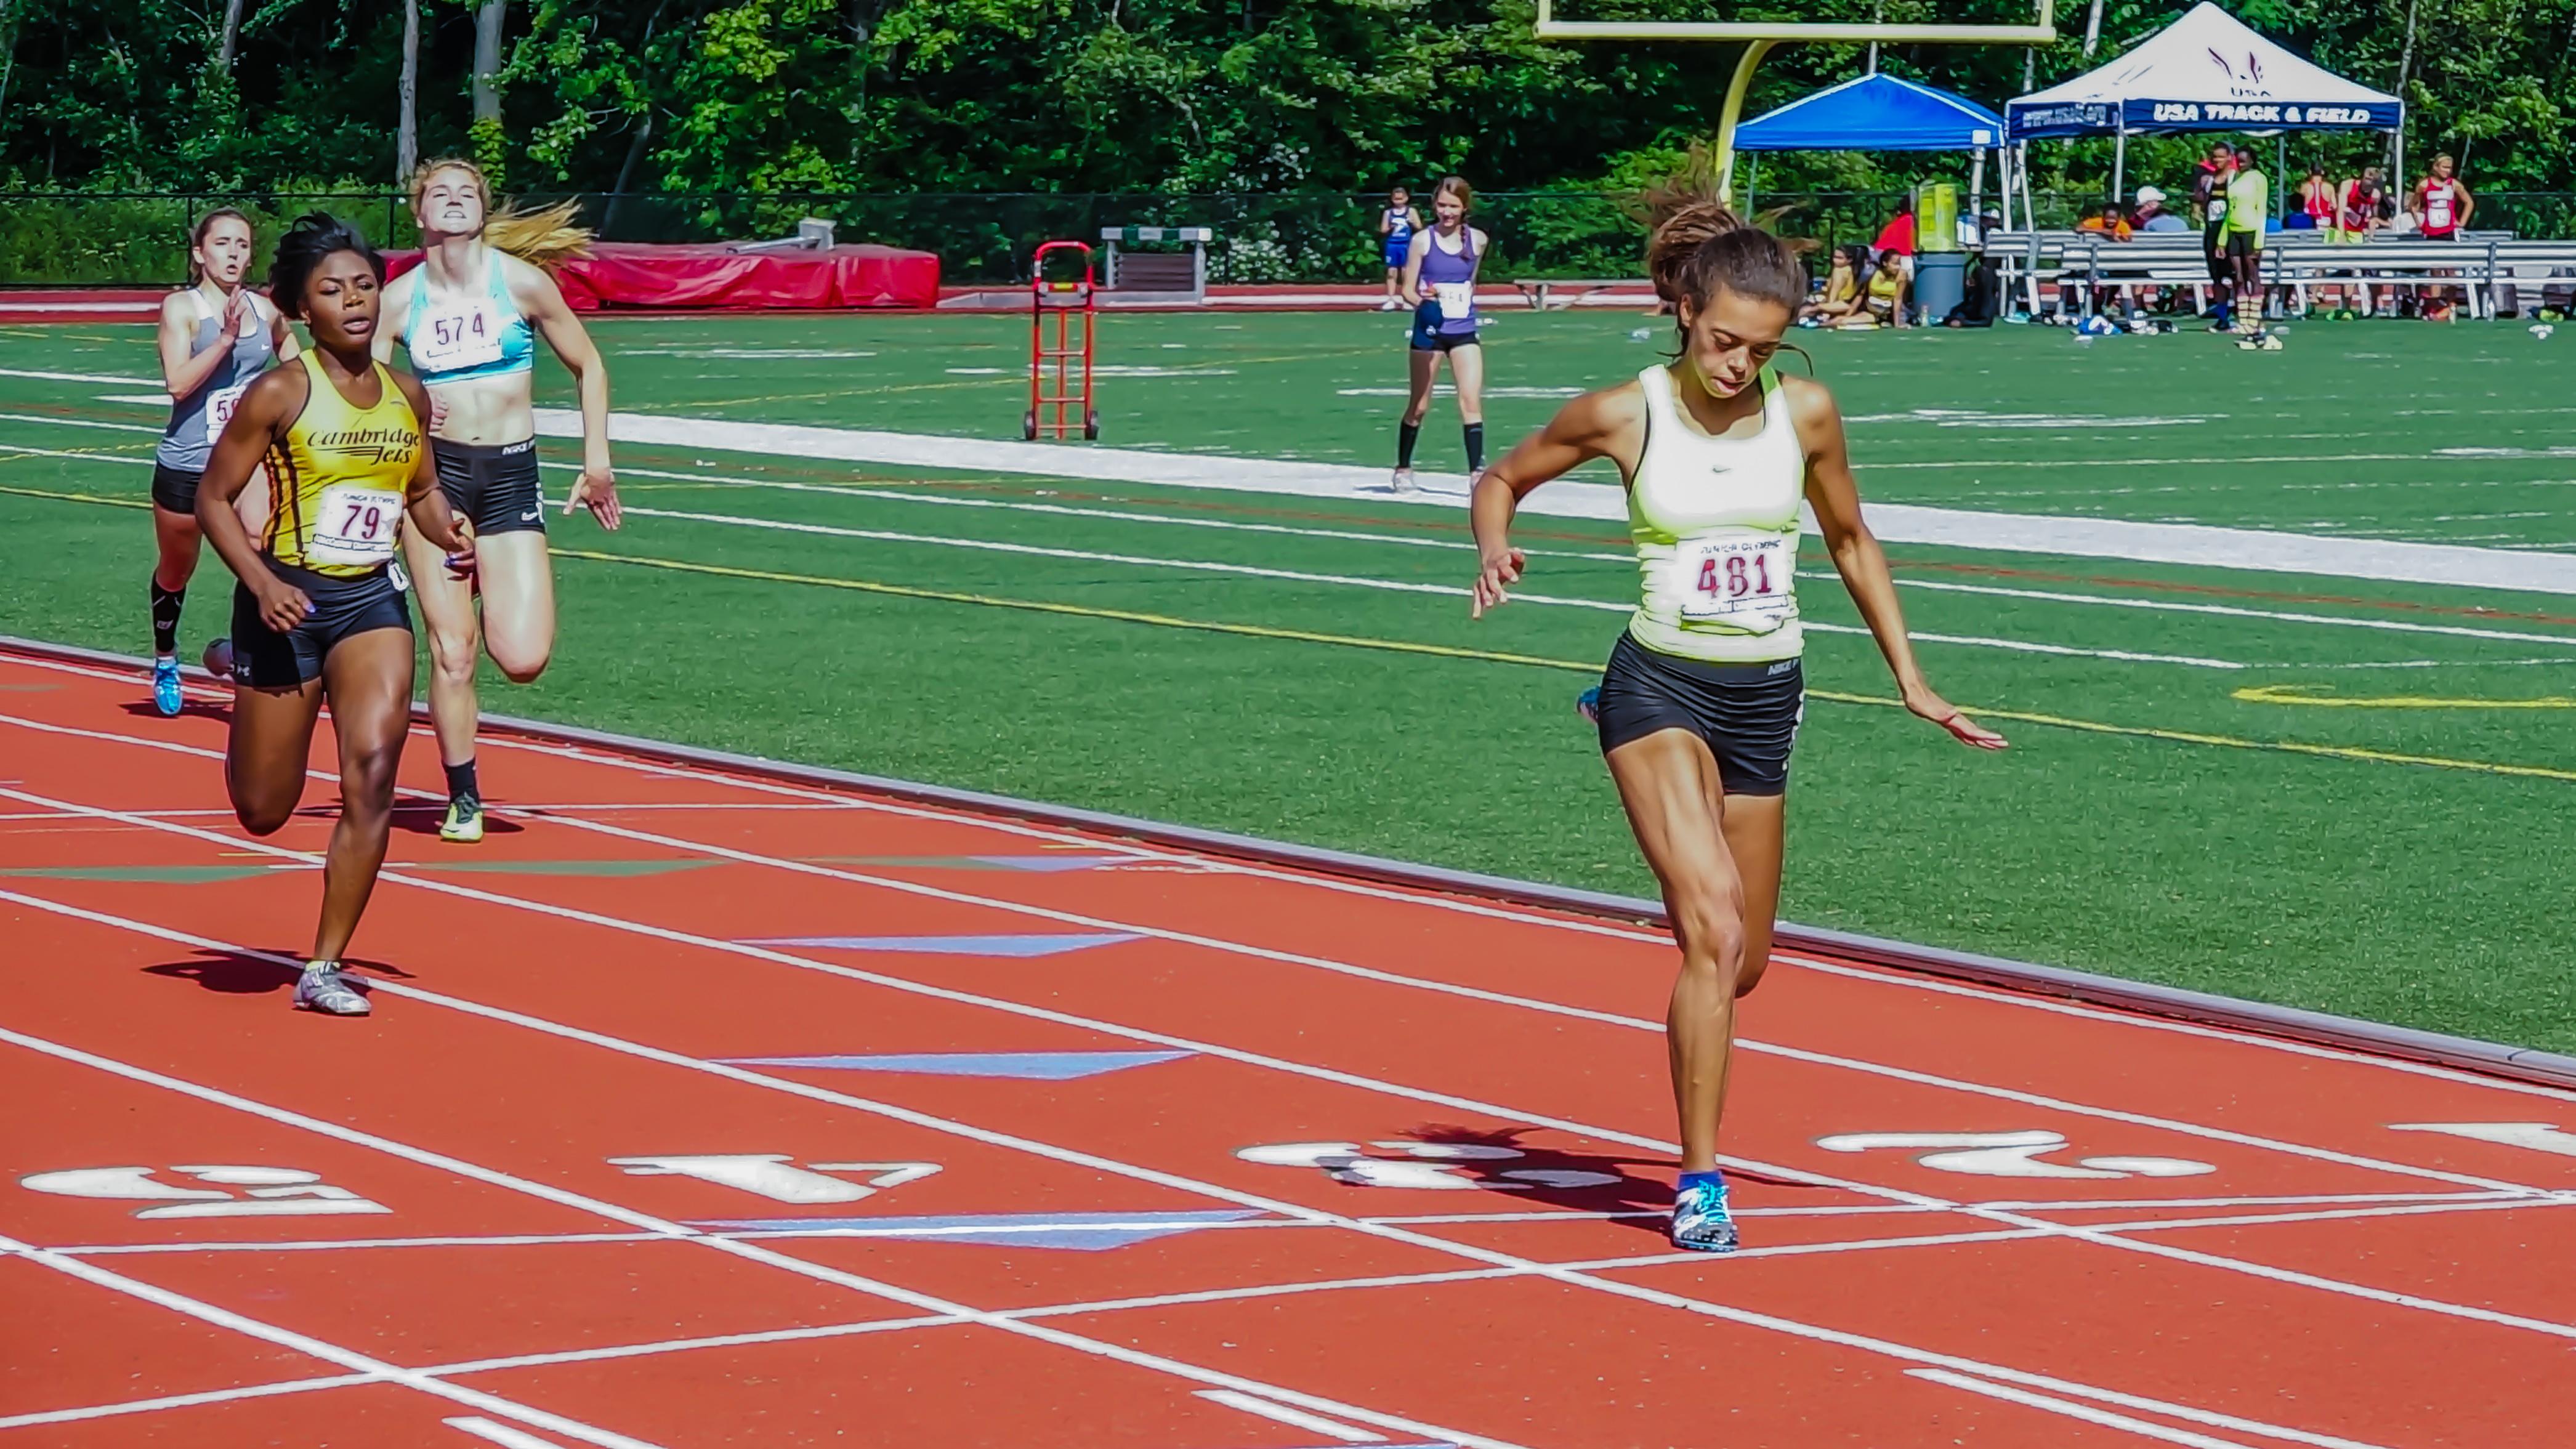 2014 New England Junior Olympics